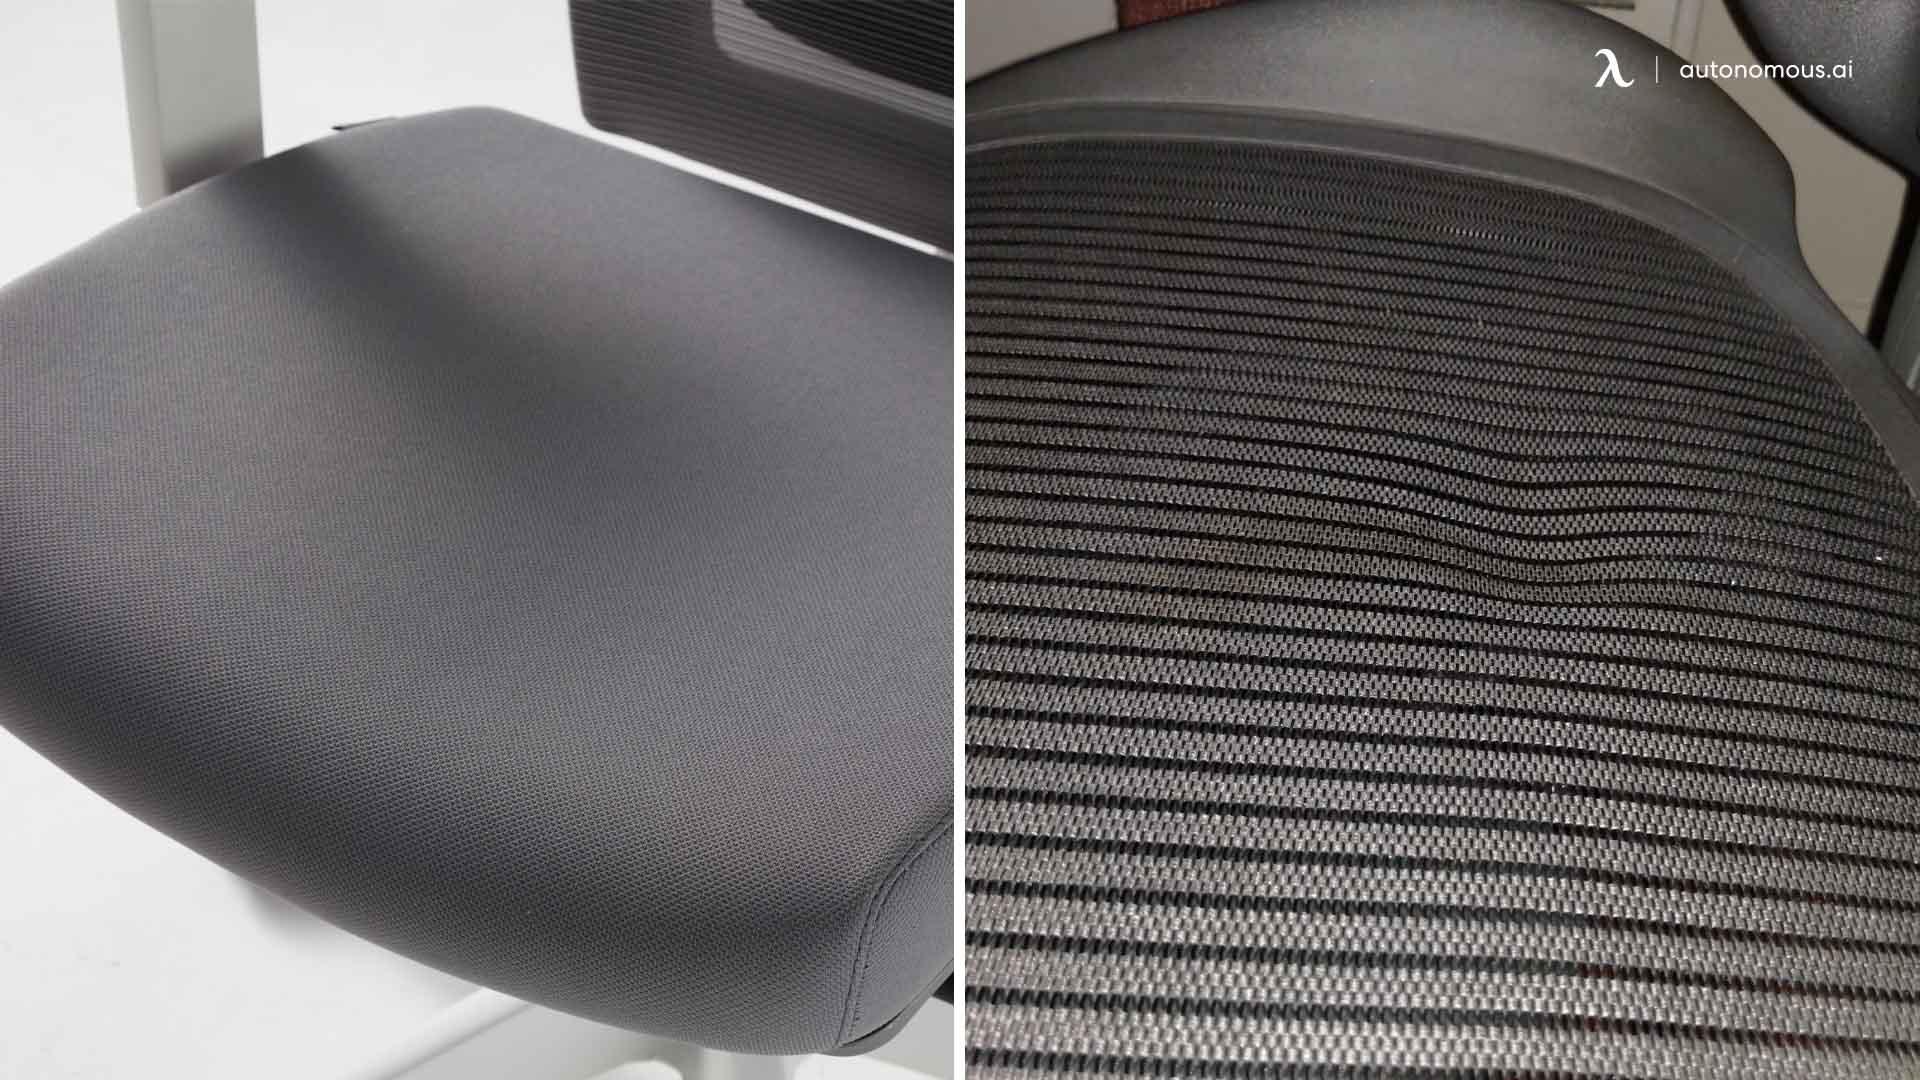 Padded Seats vs. Open Mesh